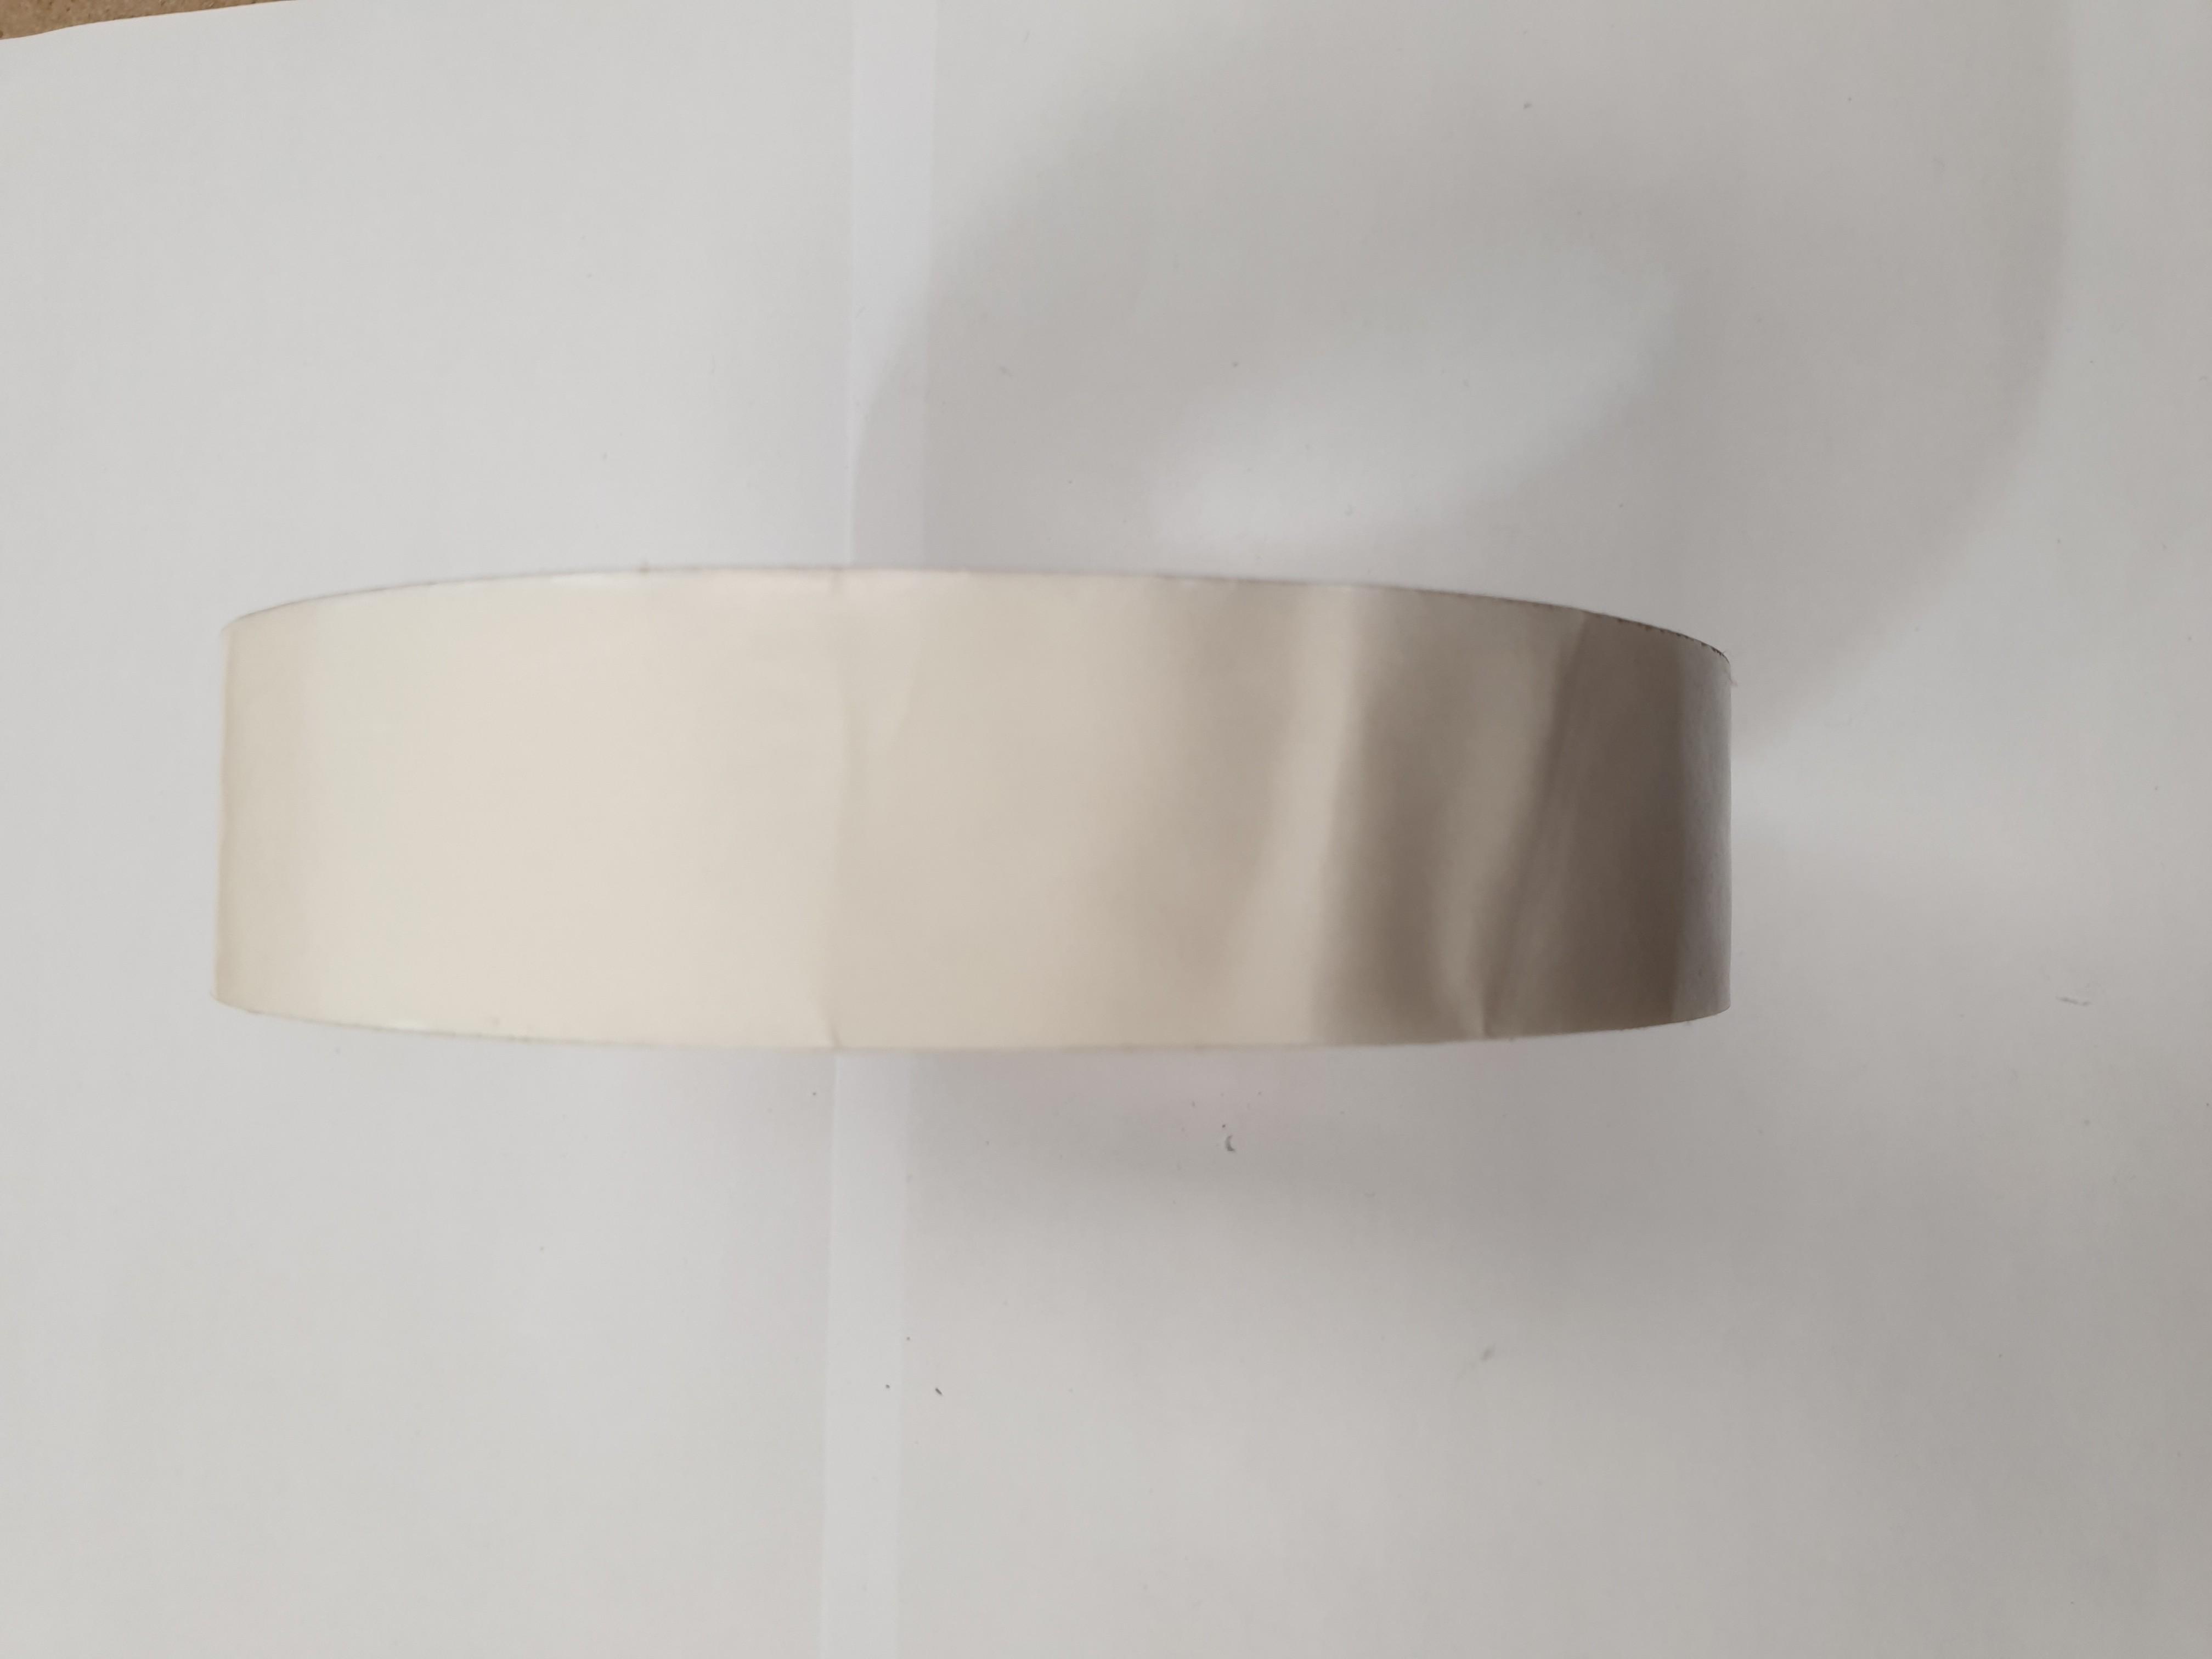 Illuminous Draft Stripe (Cruising)